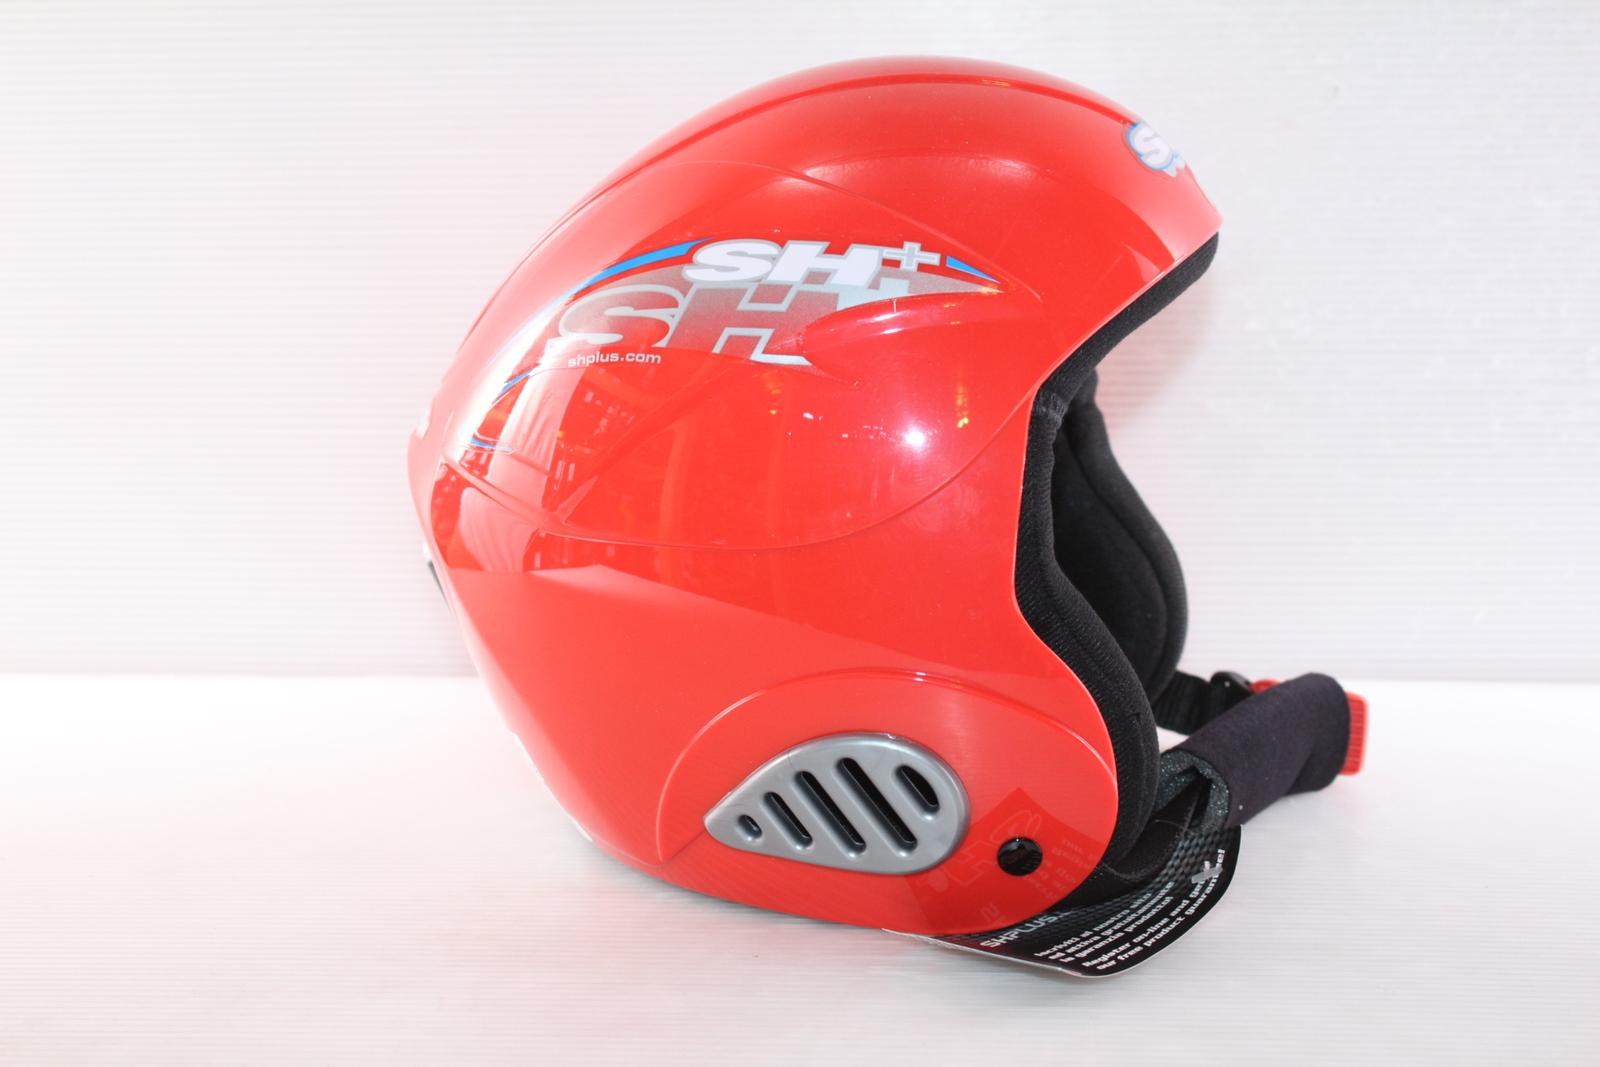 Dětská lyžařská helma SH+ EX1 EVO III vel. 54